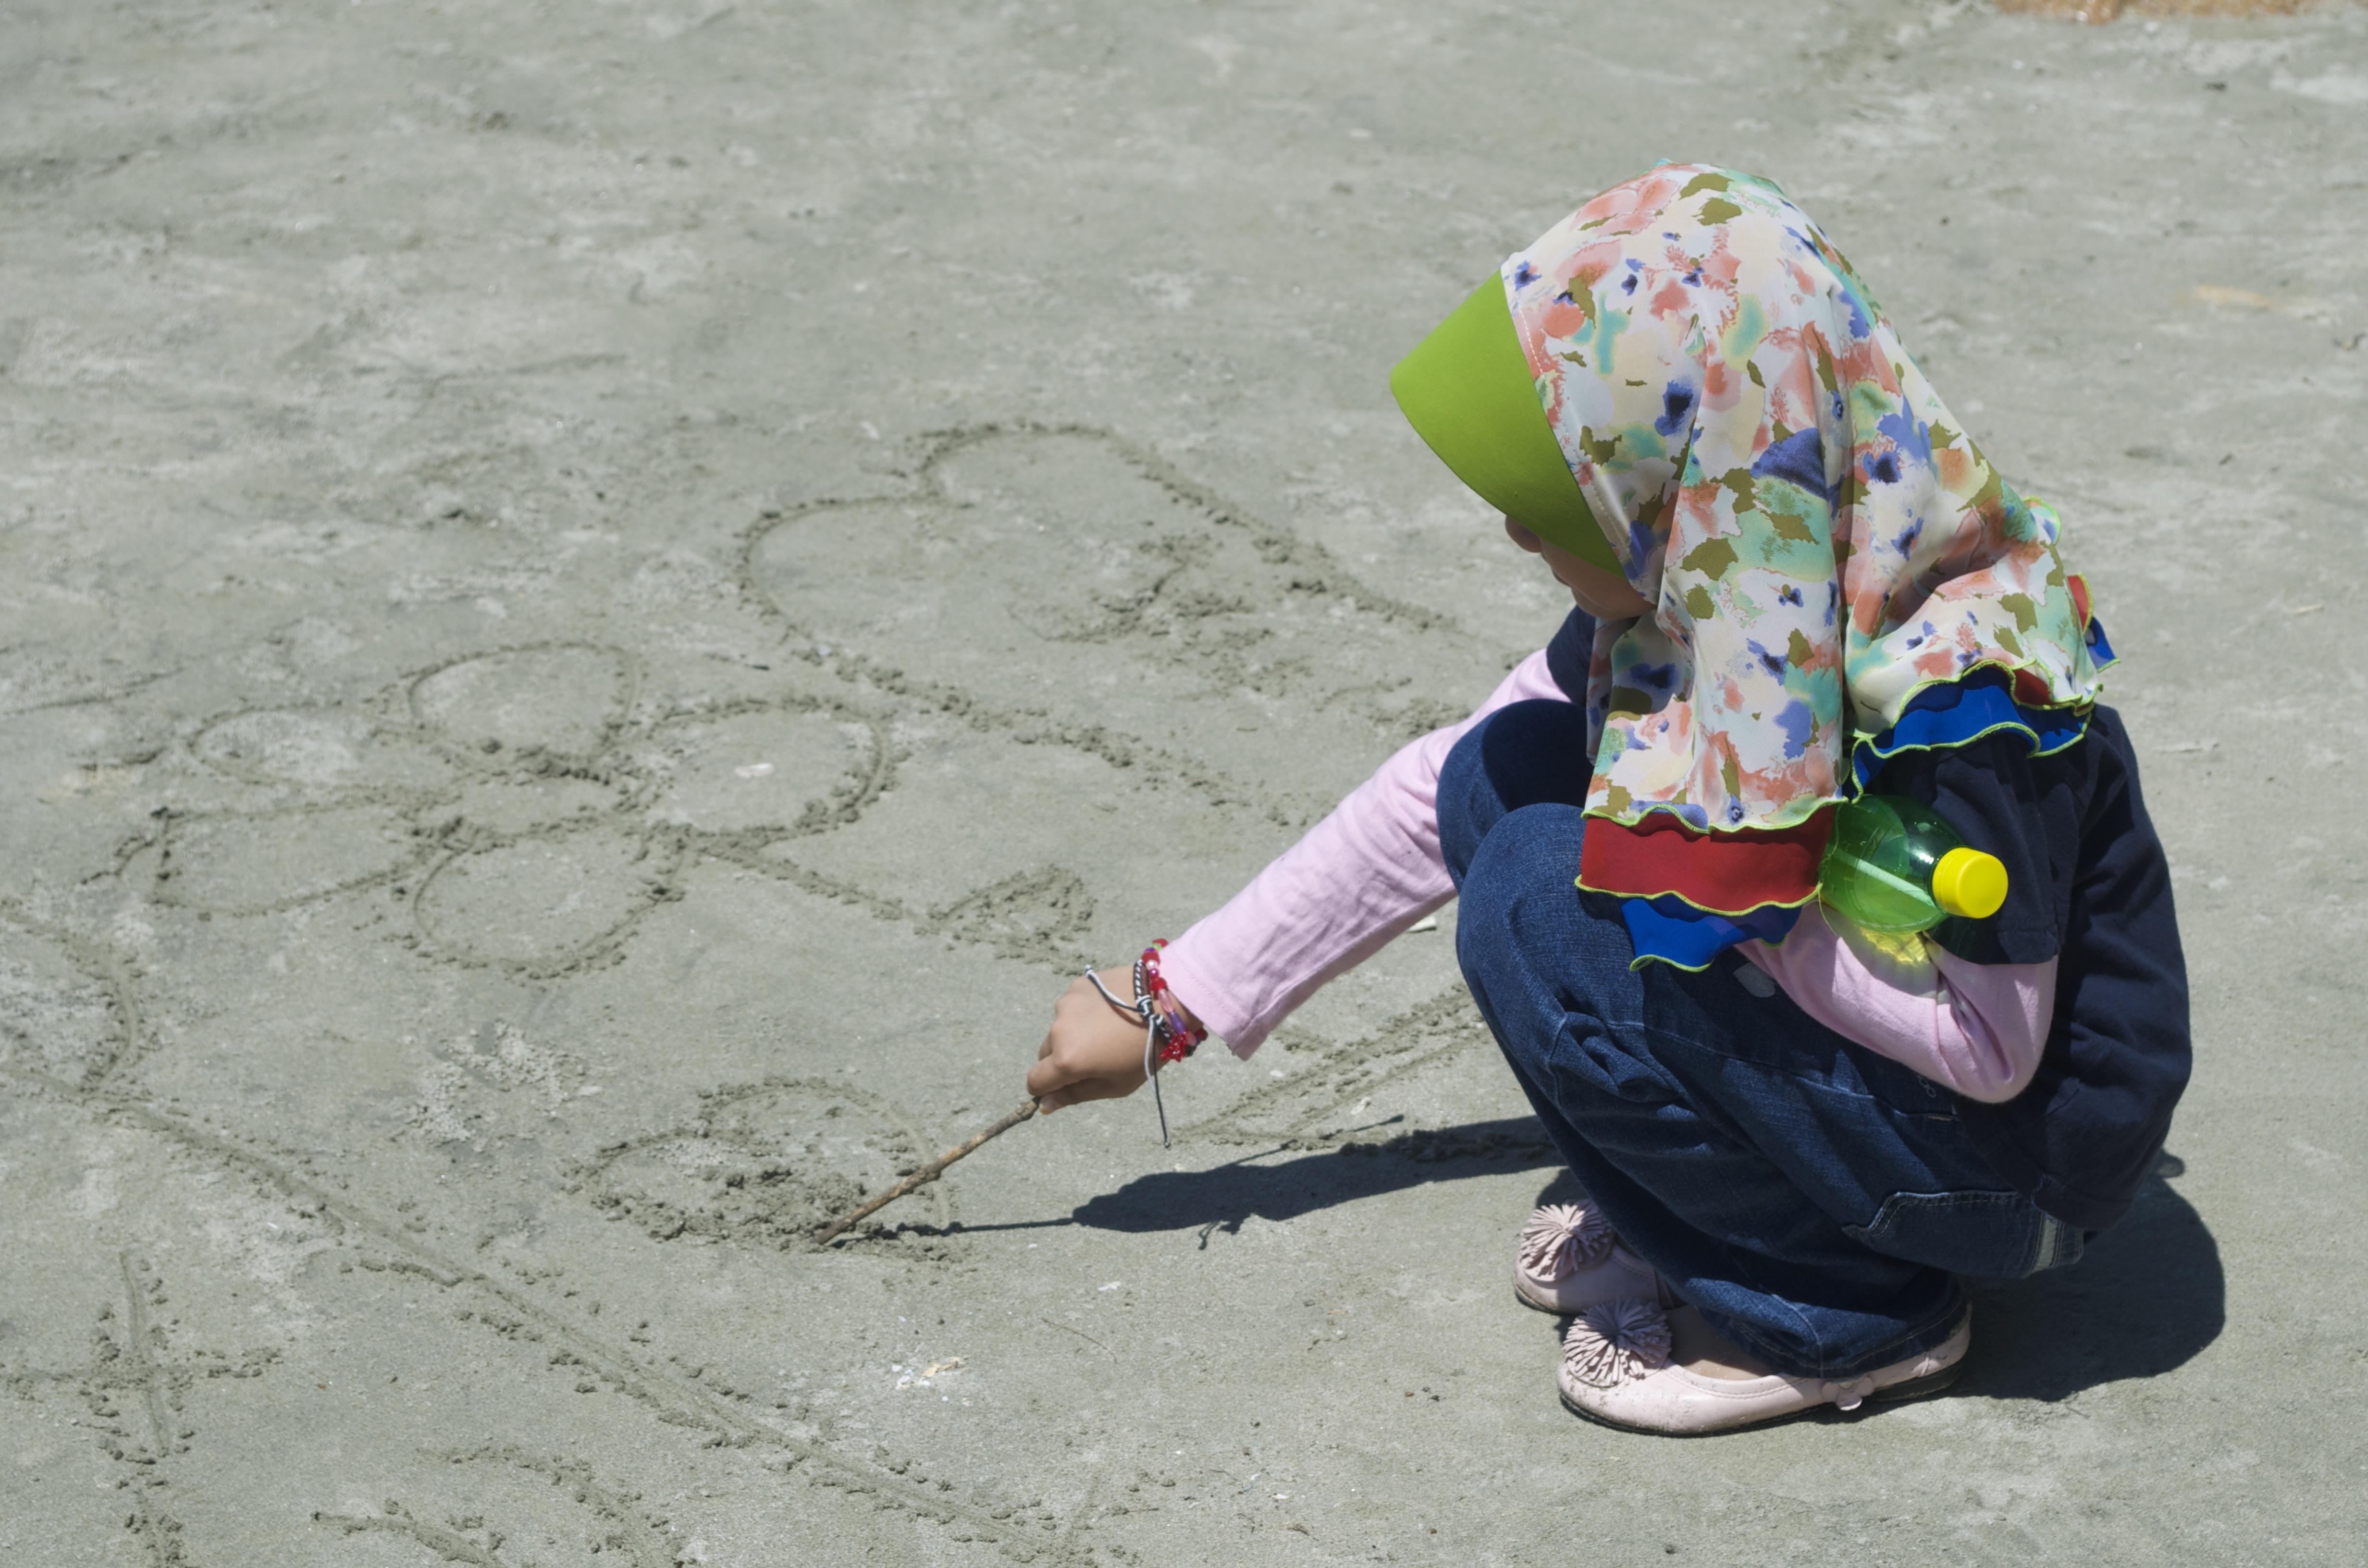 Gambar Pantai Pasir Orang Gadis Bermain Musim Panas